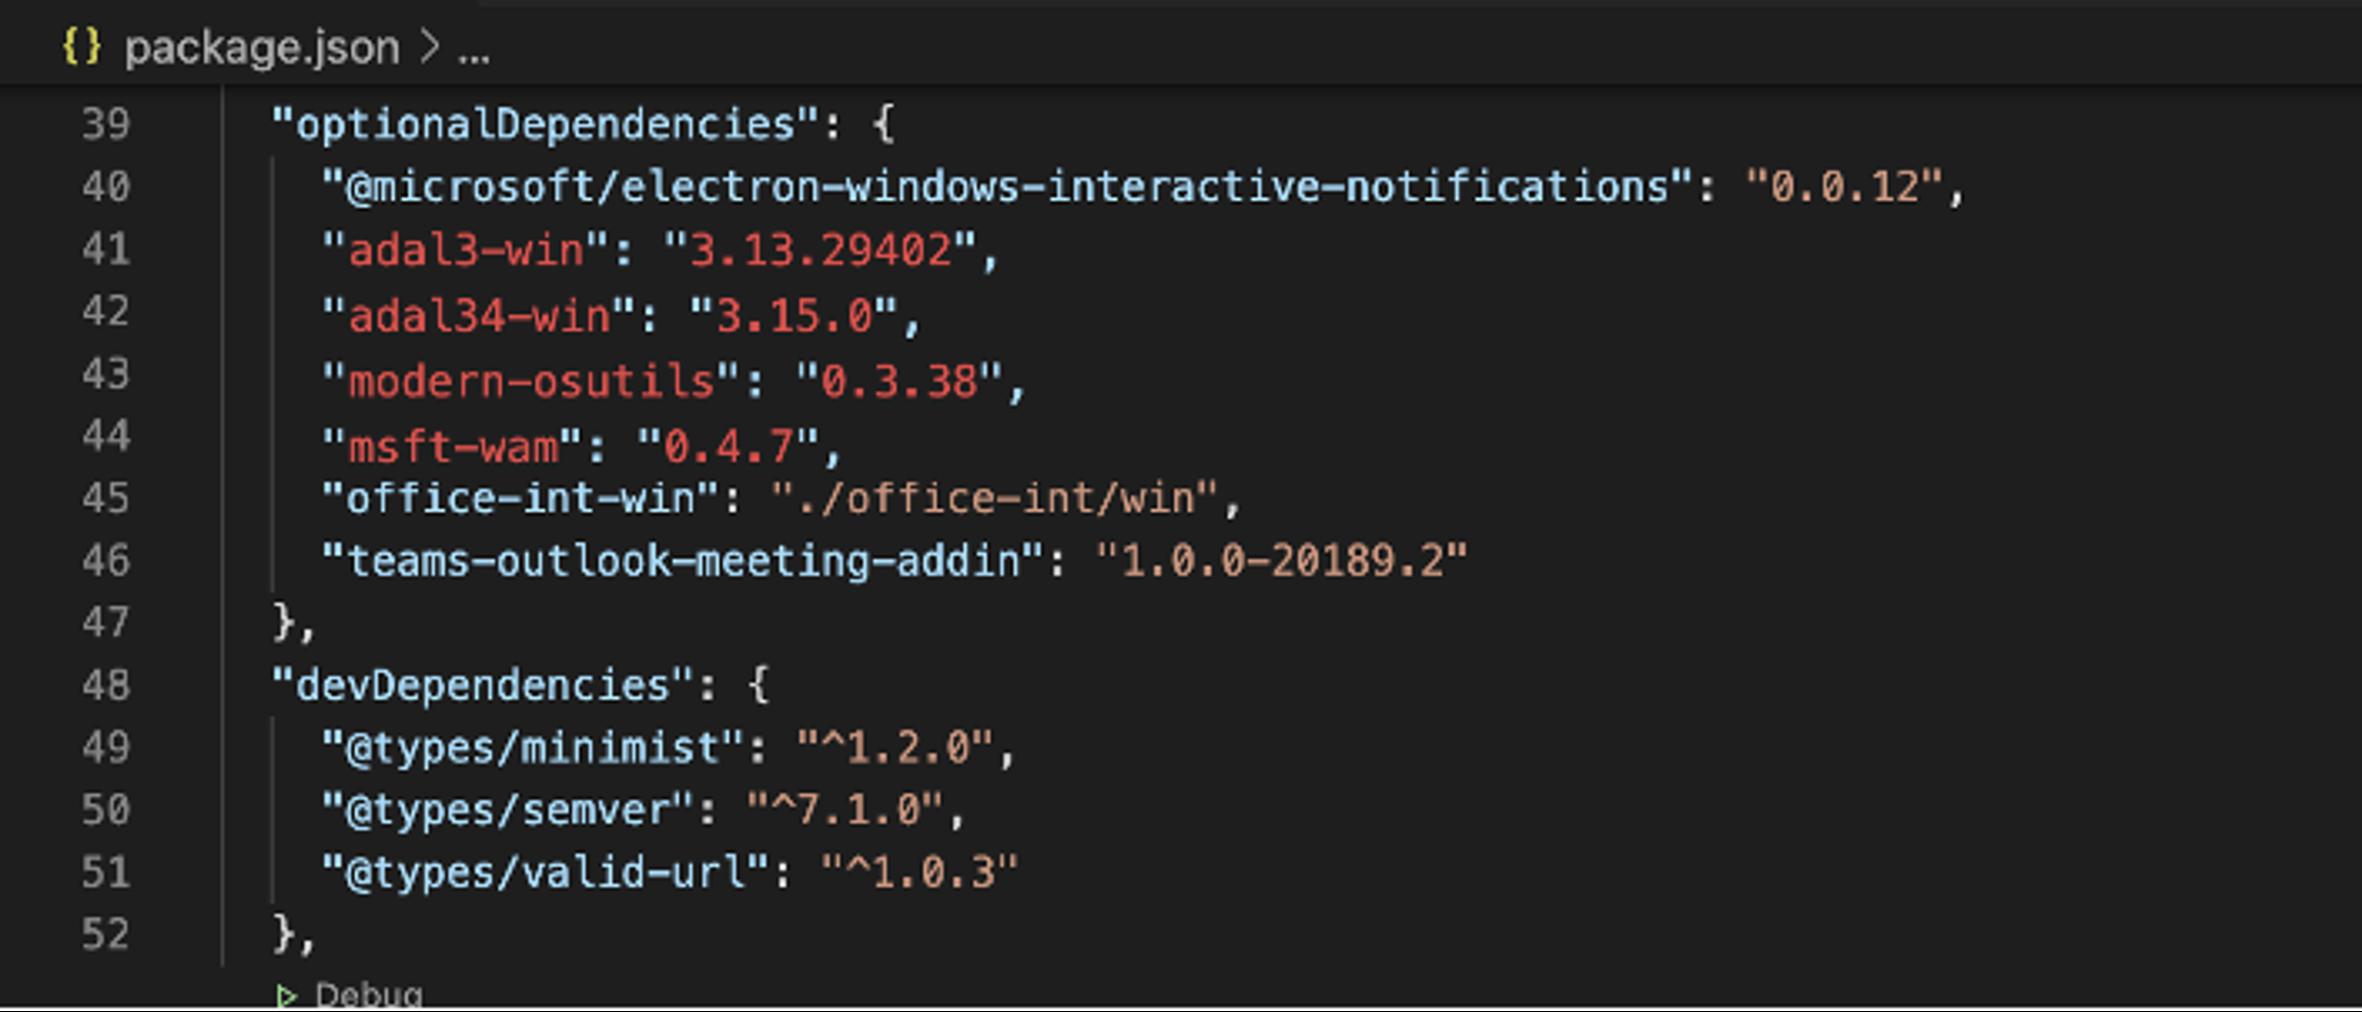 Dependency manifest found inside the Microsoft Teams' desktop application.